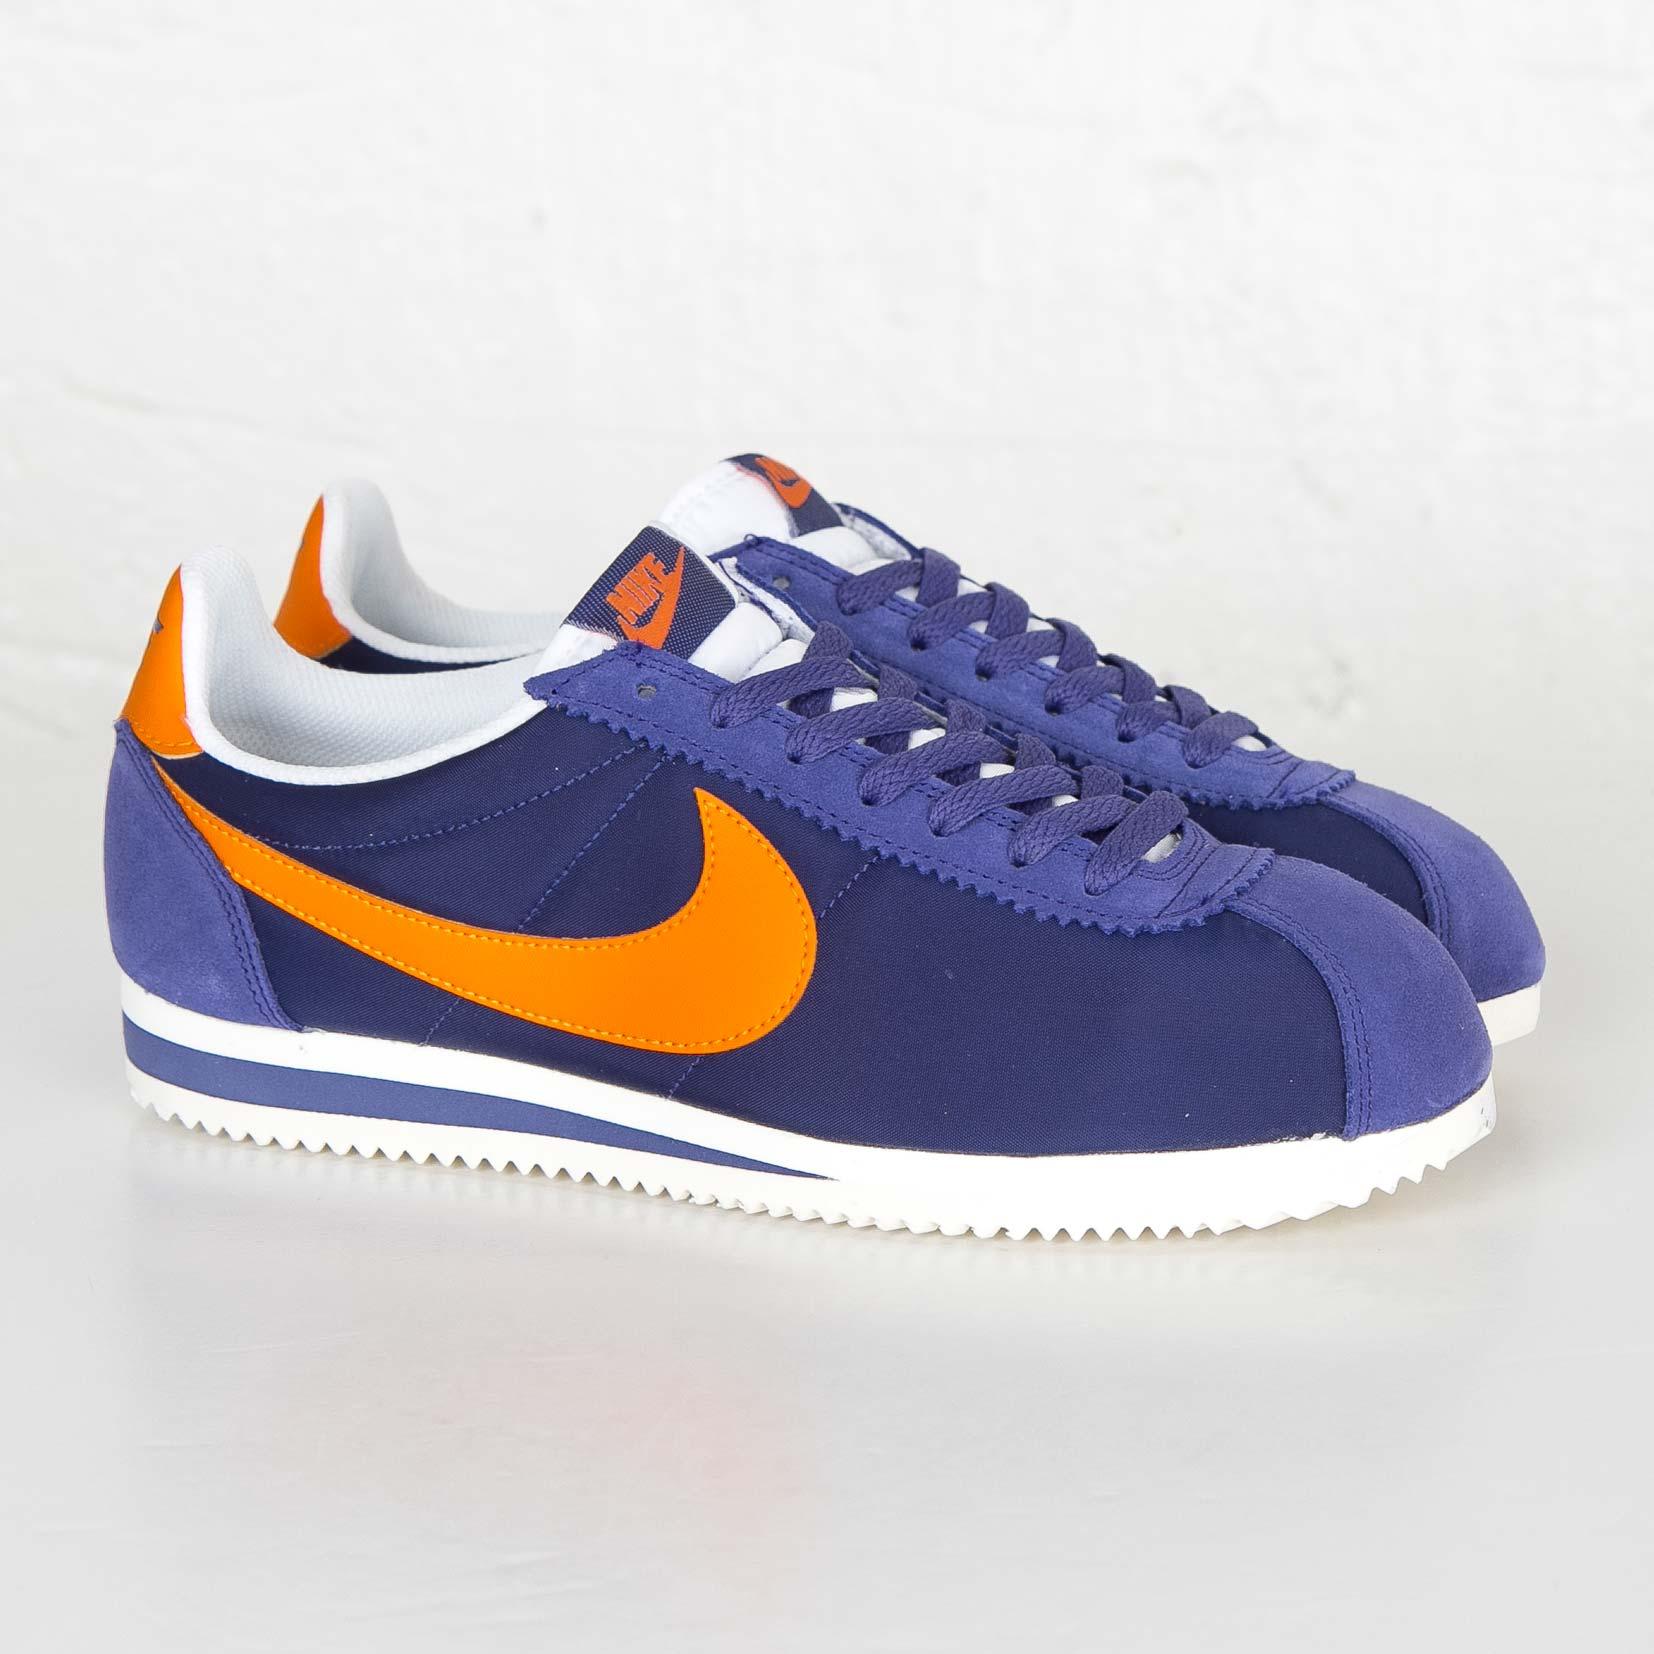 Nike Classic Cortez Nylon 807472 483 Chaussuressnstuff Chaussuress